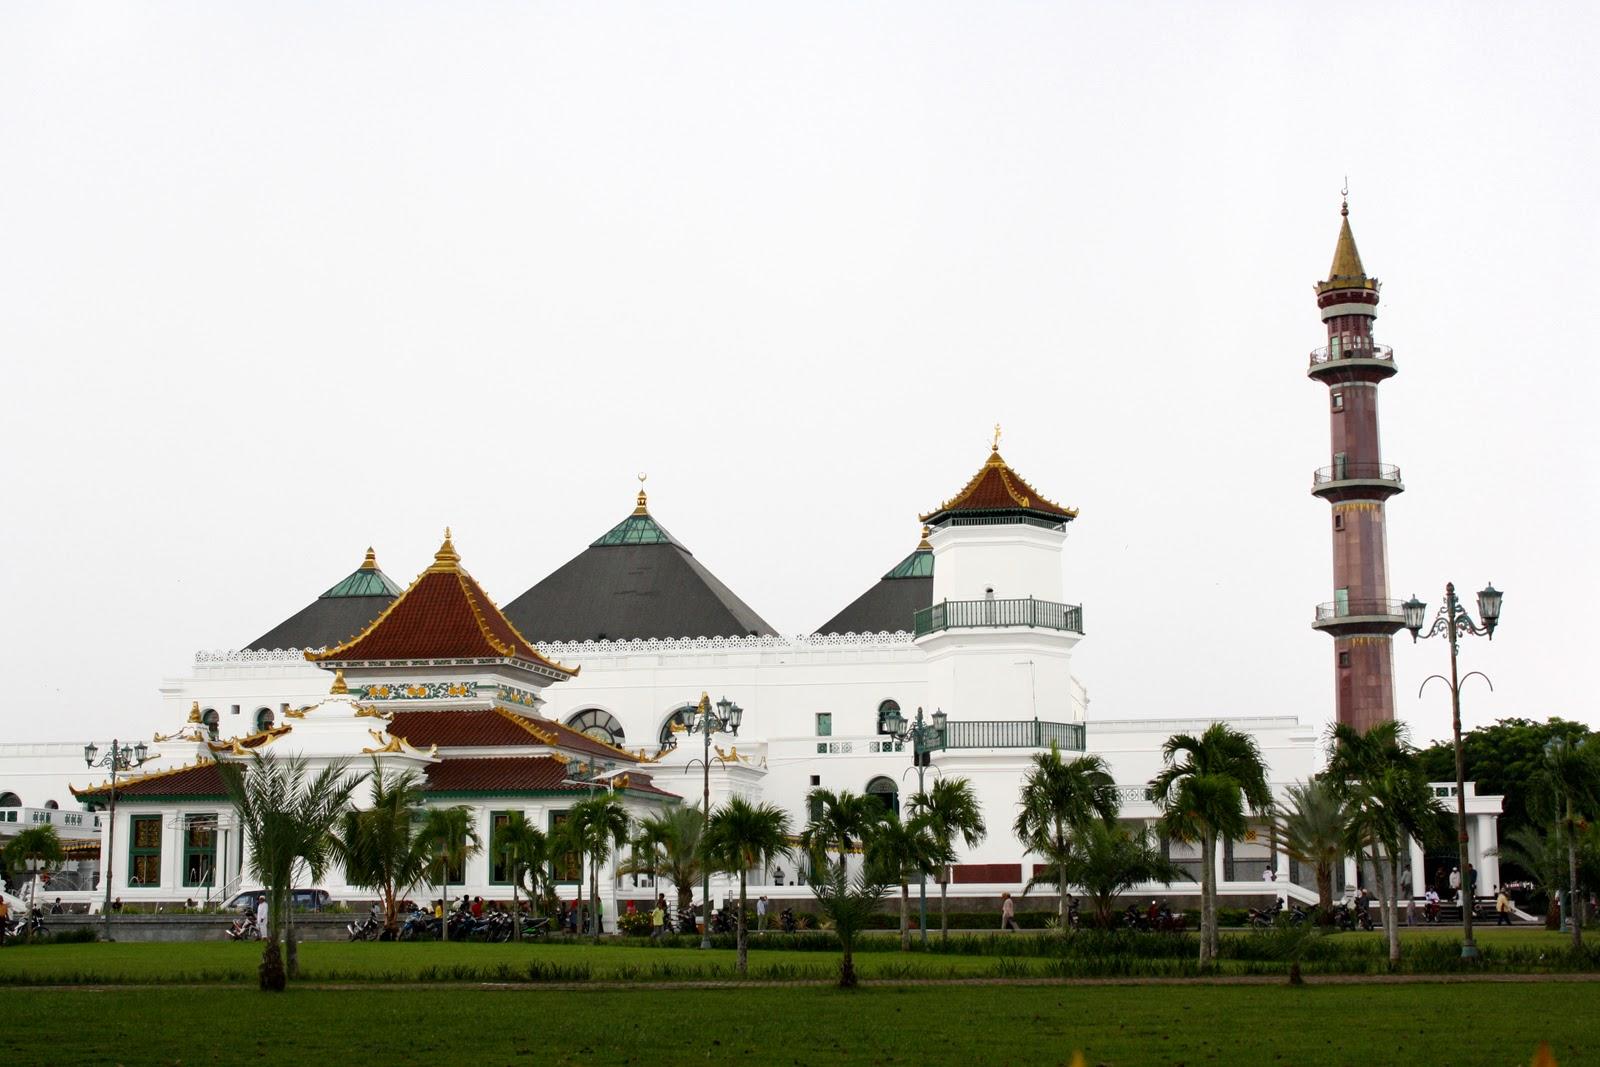 Palembang Grand Mosque Tantular Masjid Agung 1 Sultan Mahmud Badaruddin